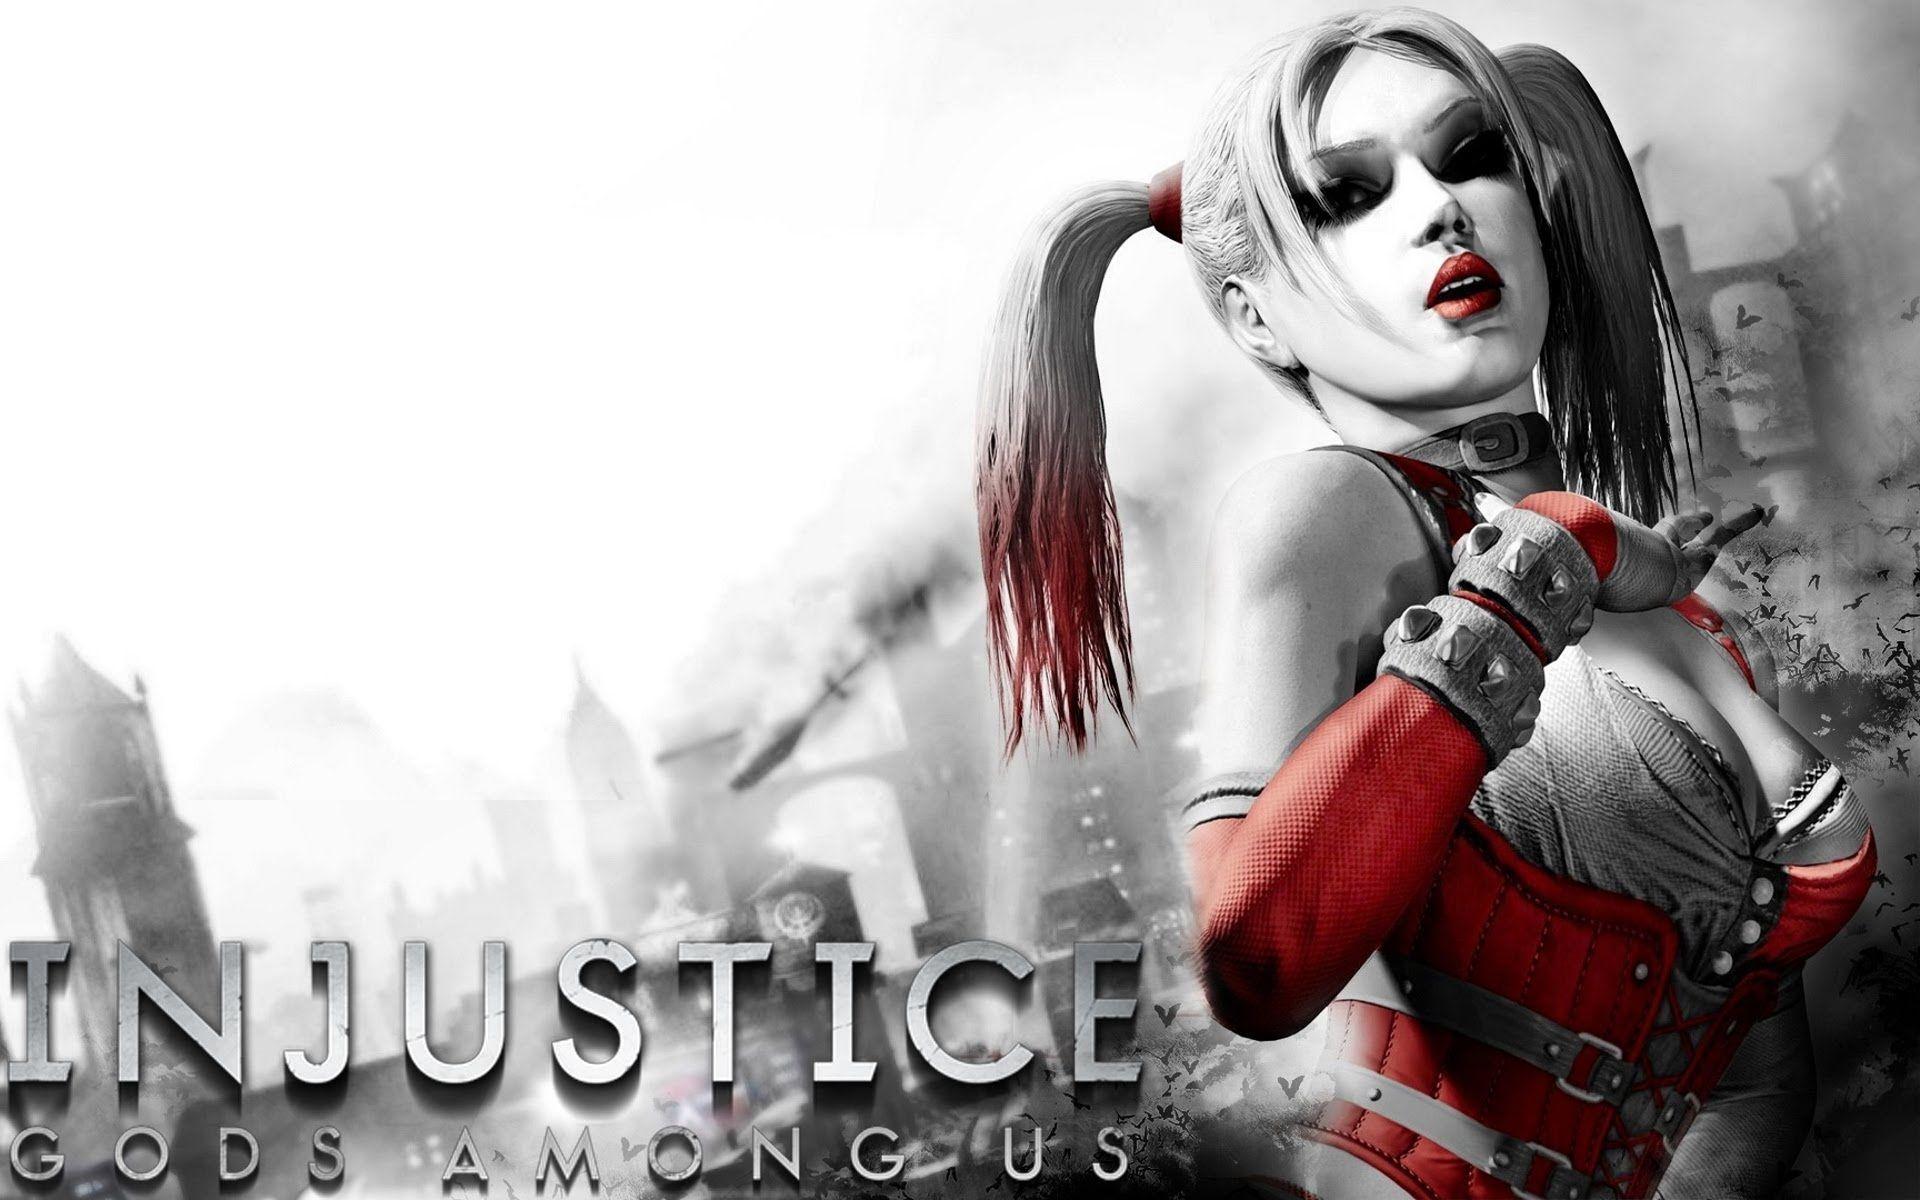 Harley Quinn Injustice Wallpapers On Wallpaperdog